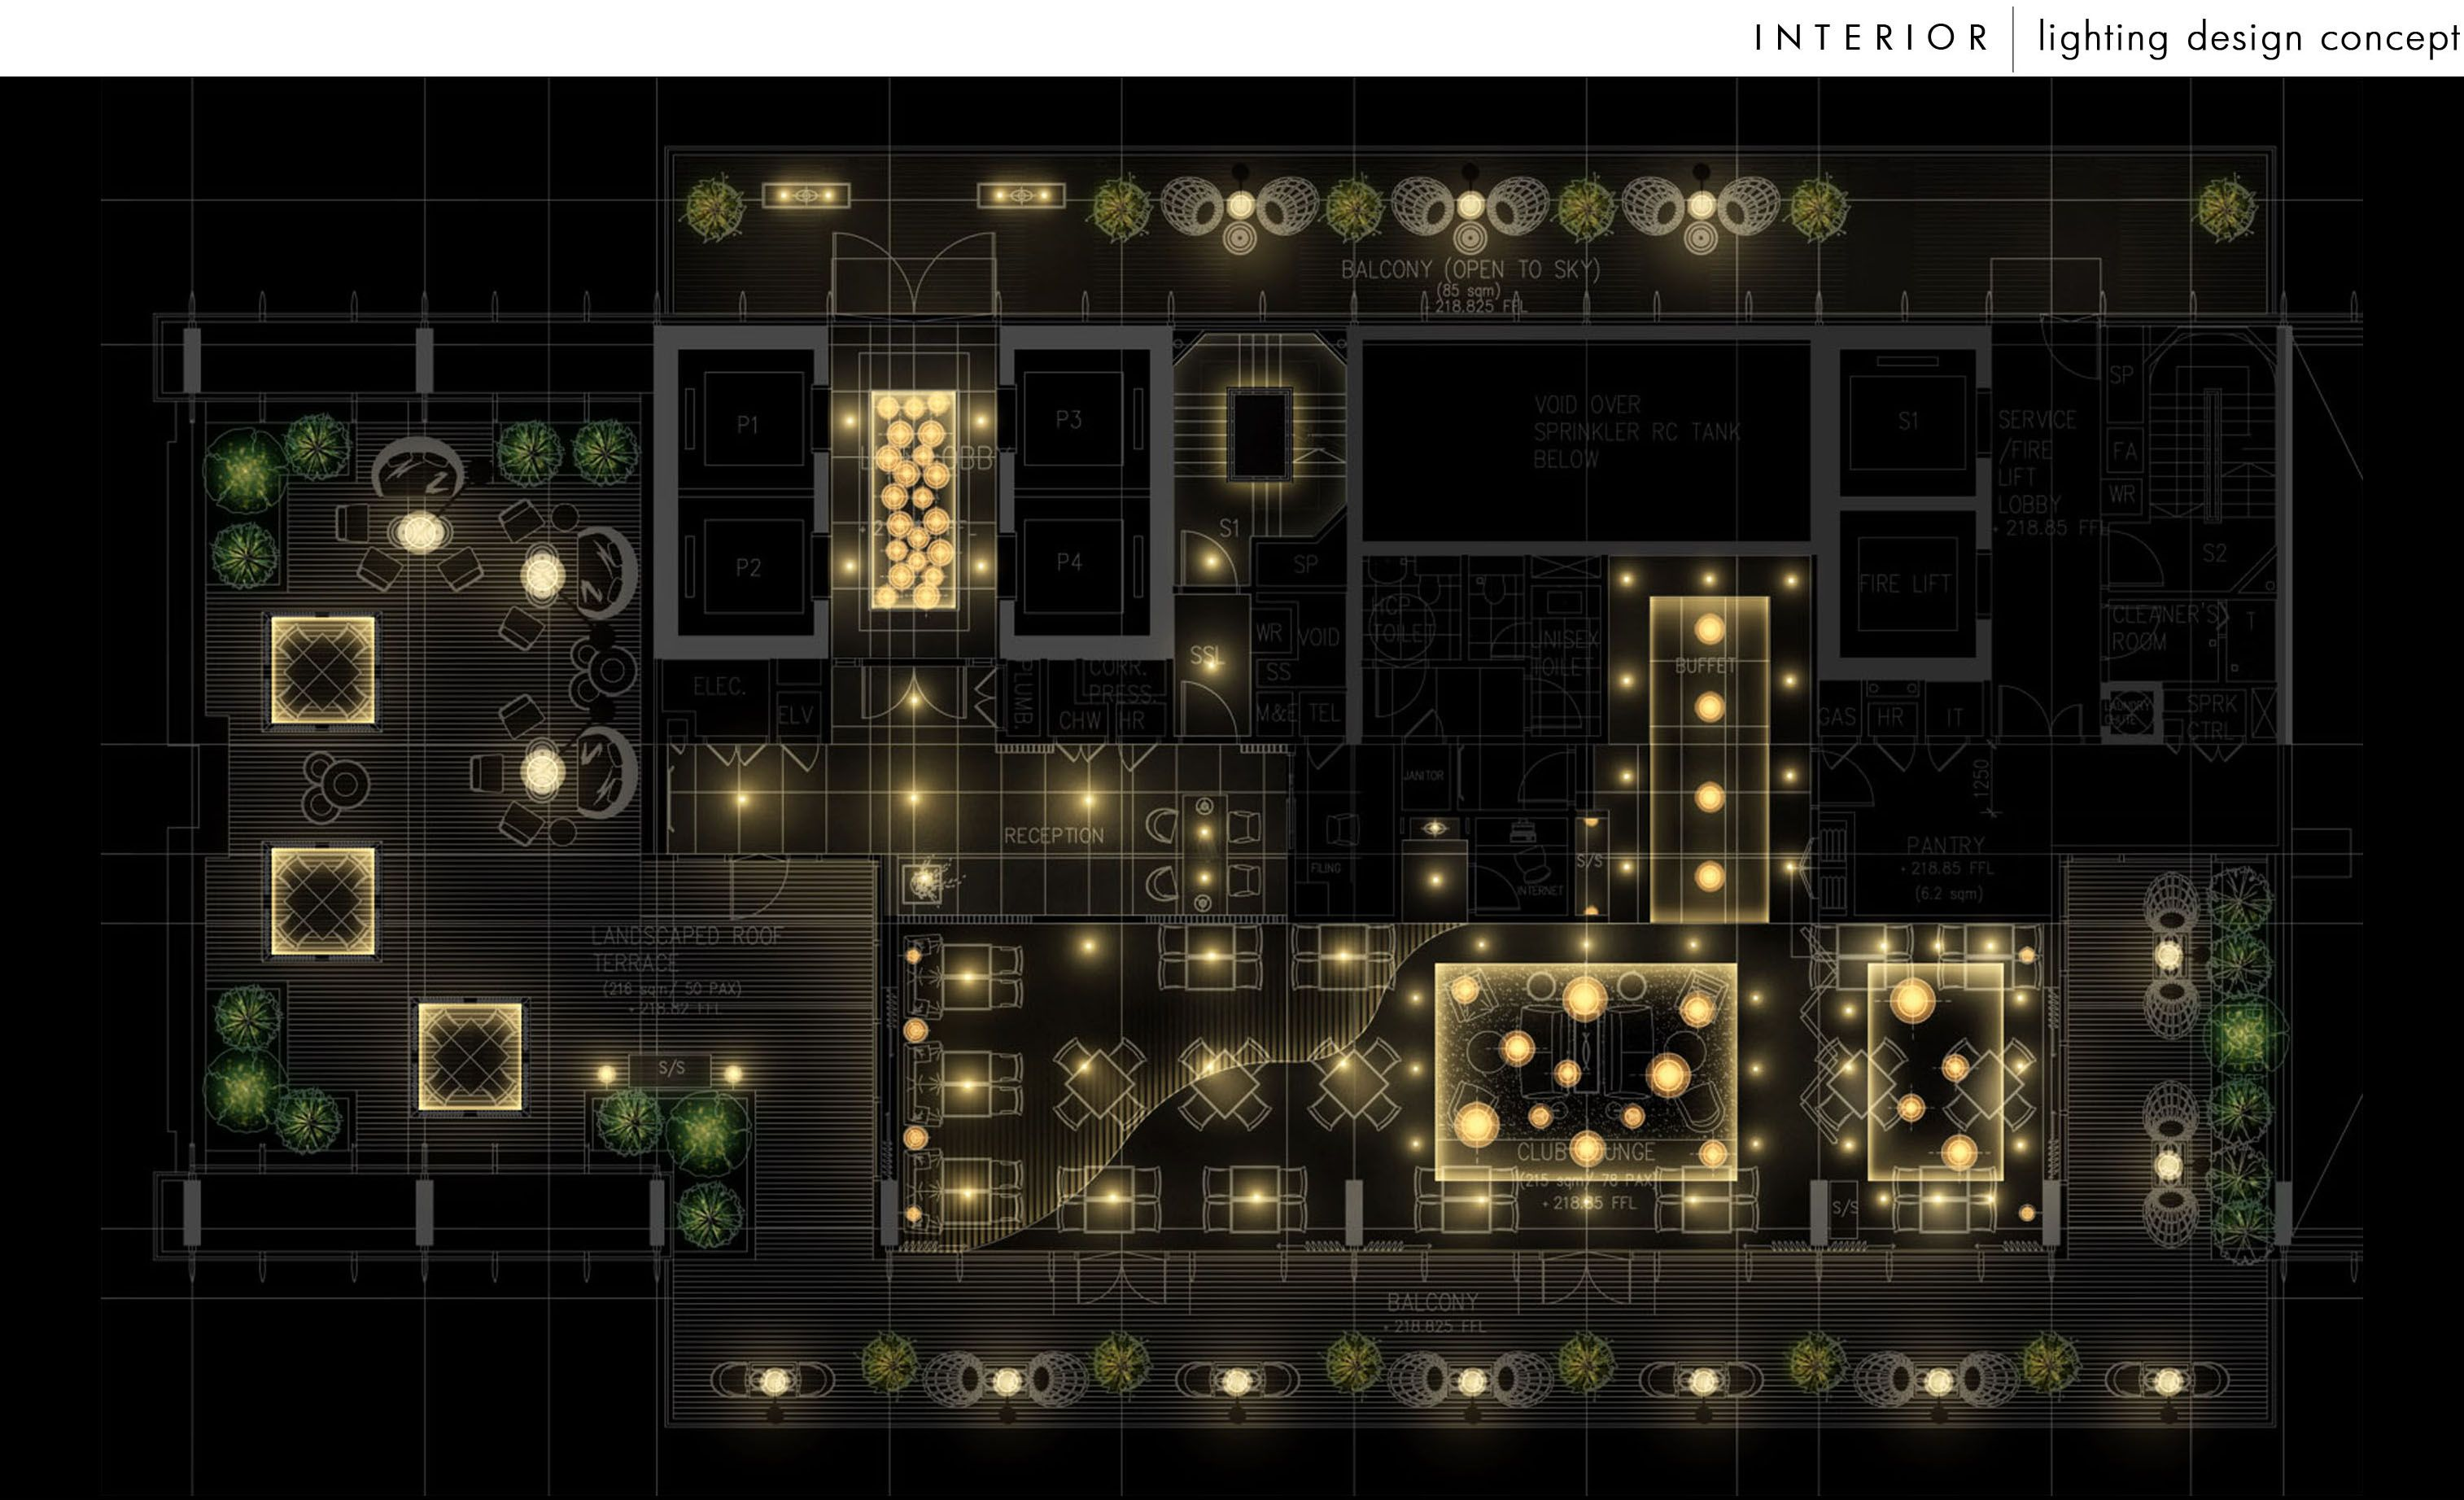 Commercial Interior Lighting Design Under Corporate